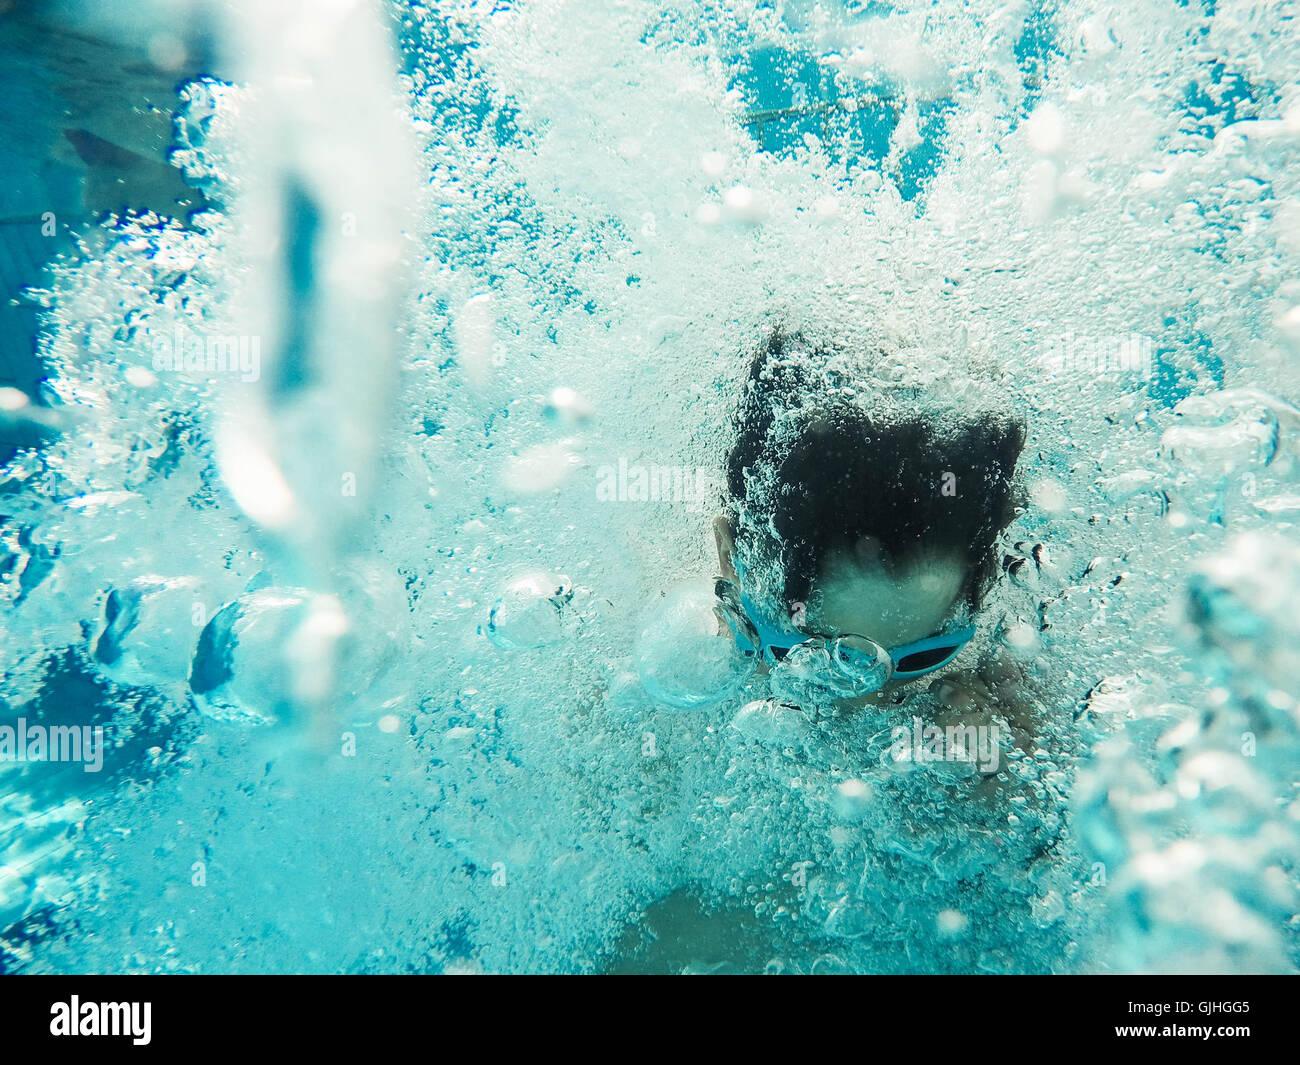 Vista submarina de boy saltando a una piscina Foto de stock